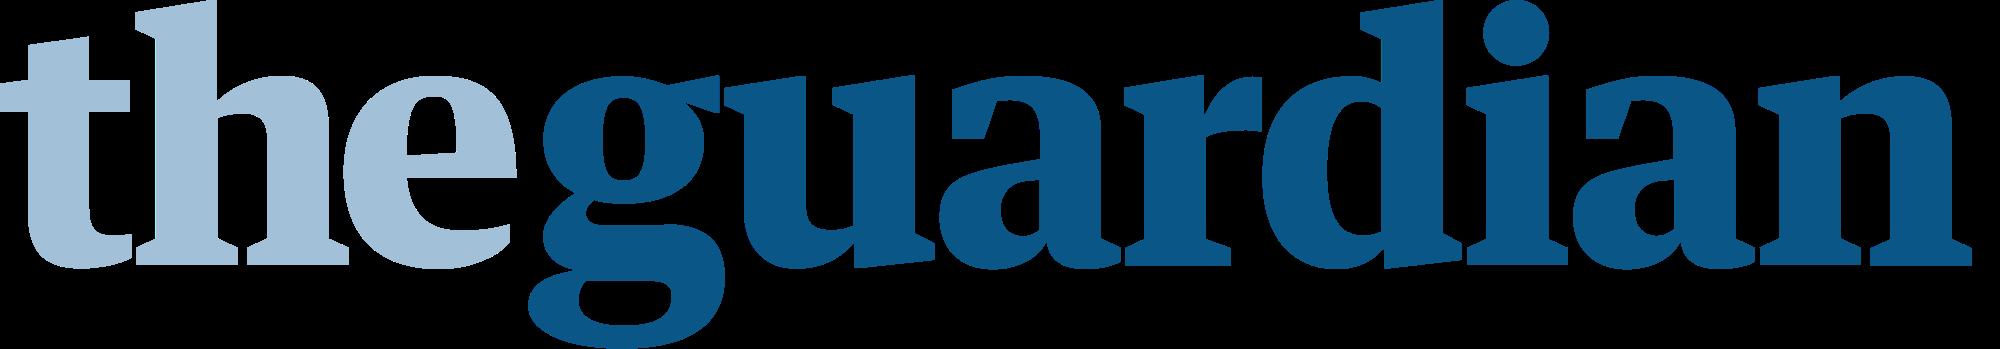 logo theguardian